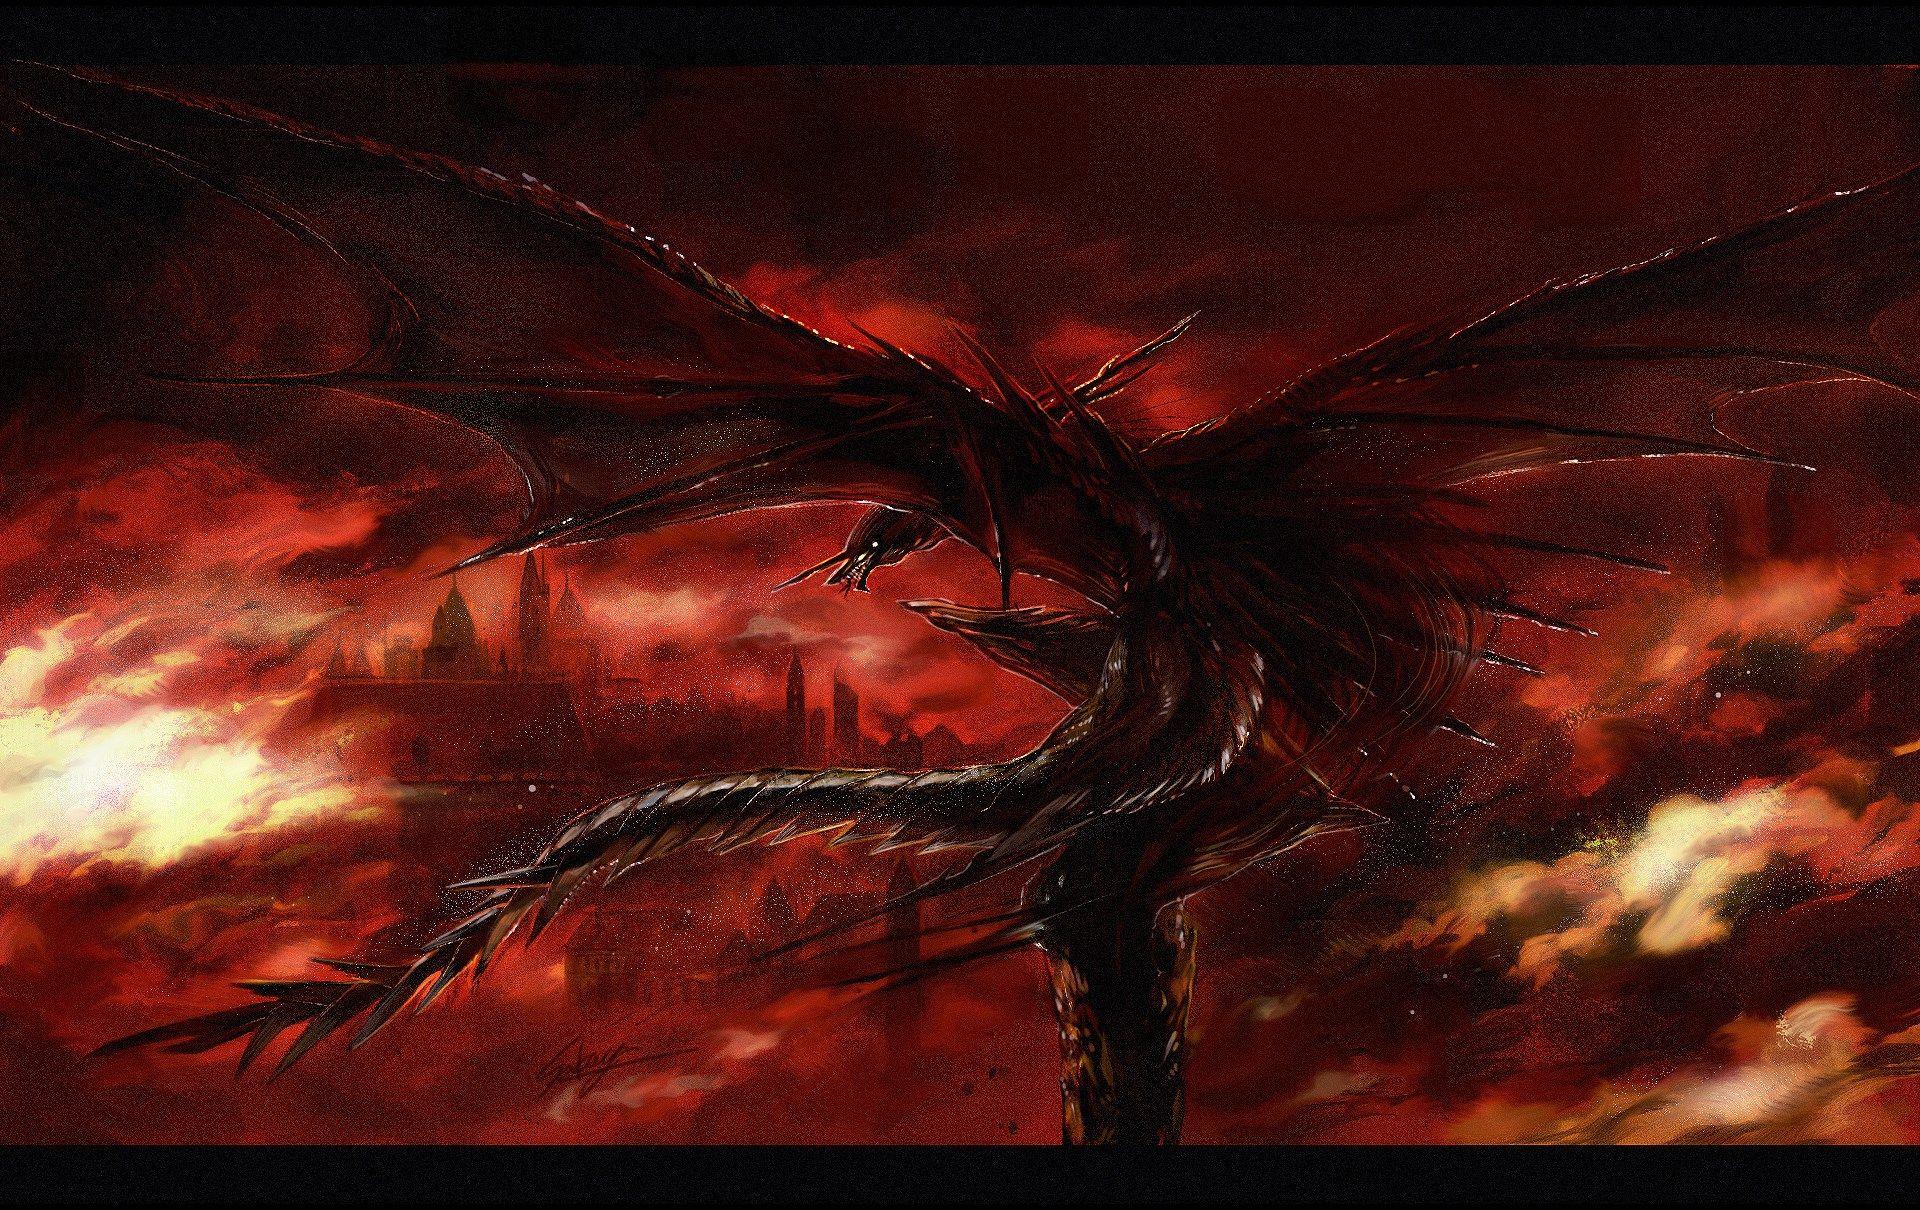 langdon stevenson free wallpaper and screensavers for dragon